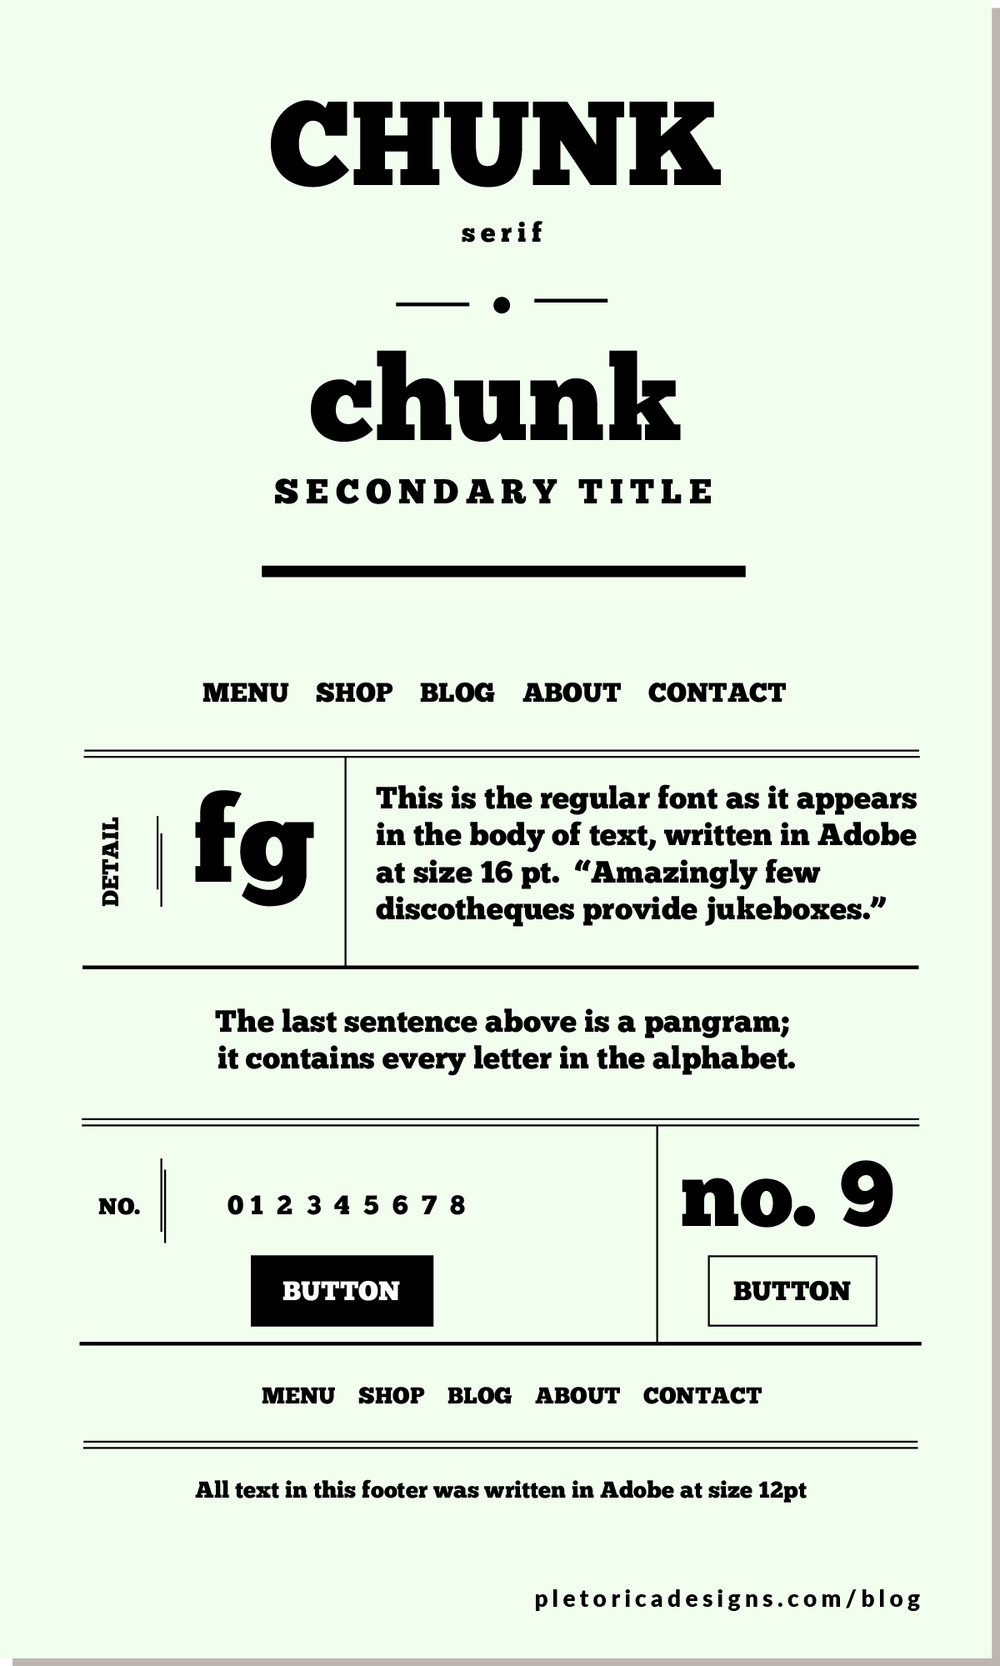 LET'S TYPE: Chunk — PLETÓRICA DESIGNS